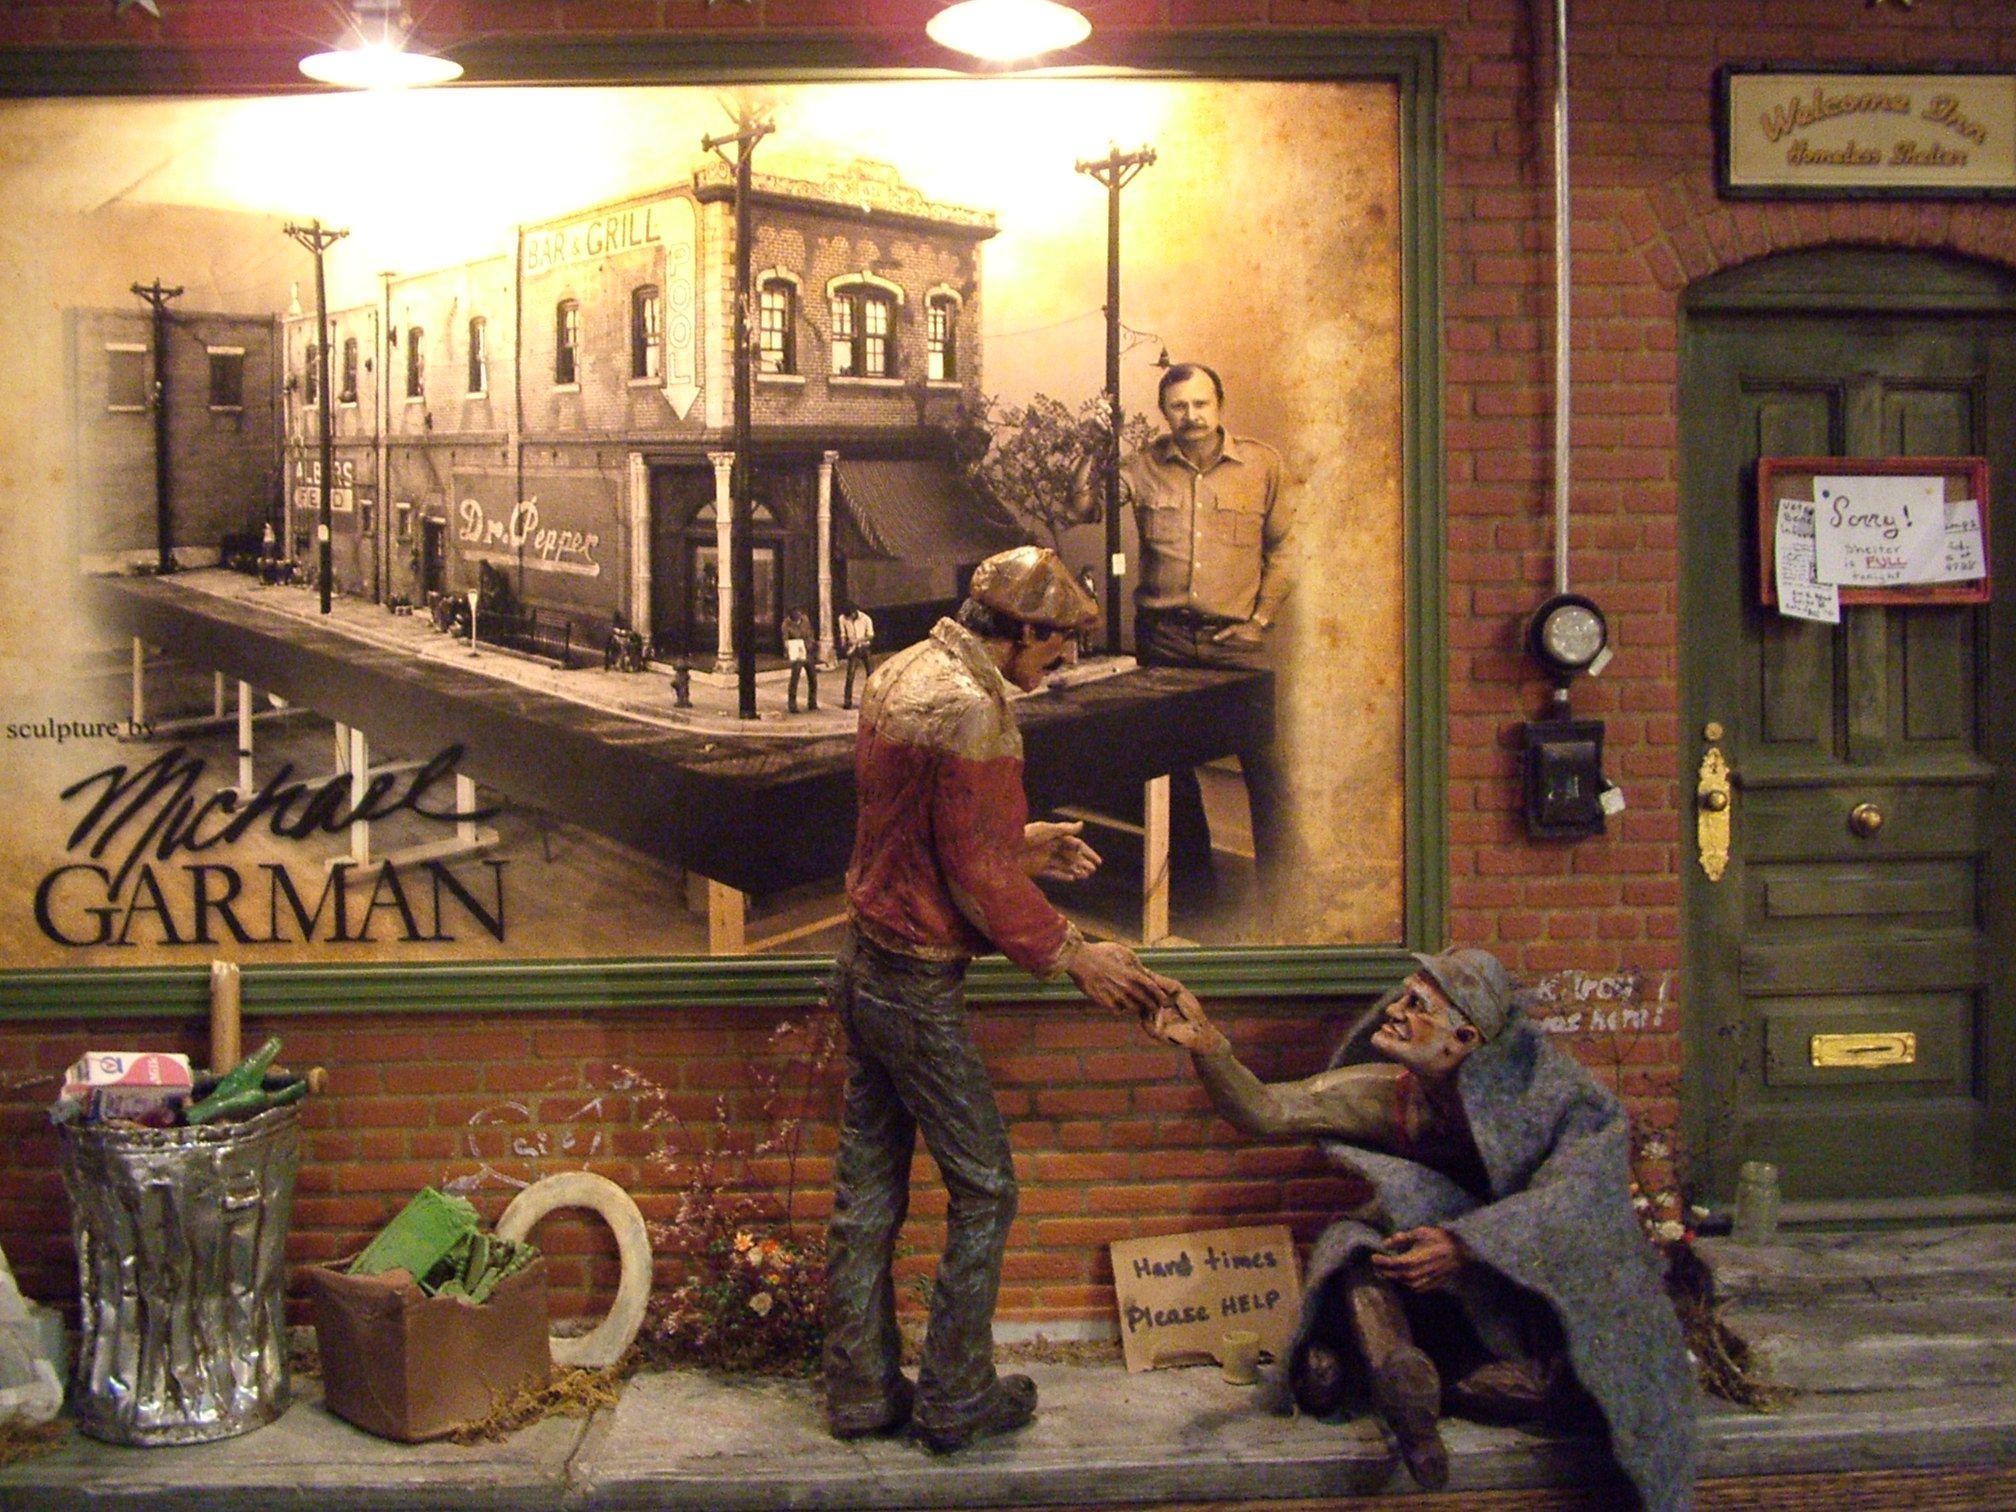 Michael Garman Sculpture Gallery Sculptures Of Any Kind